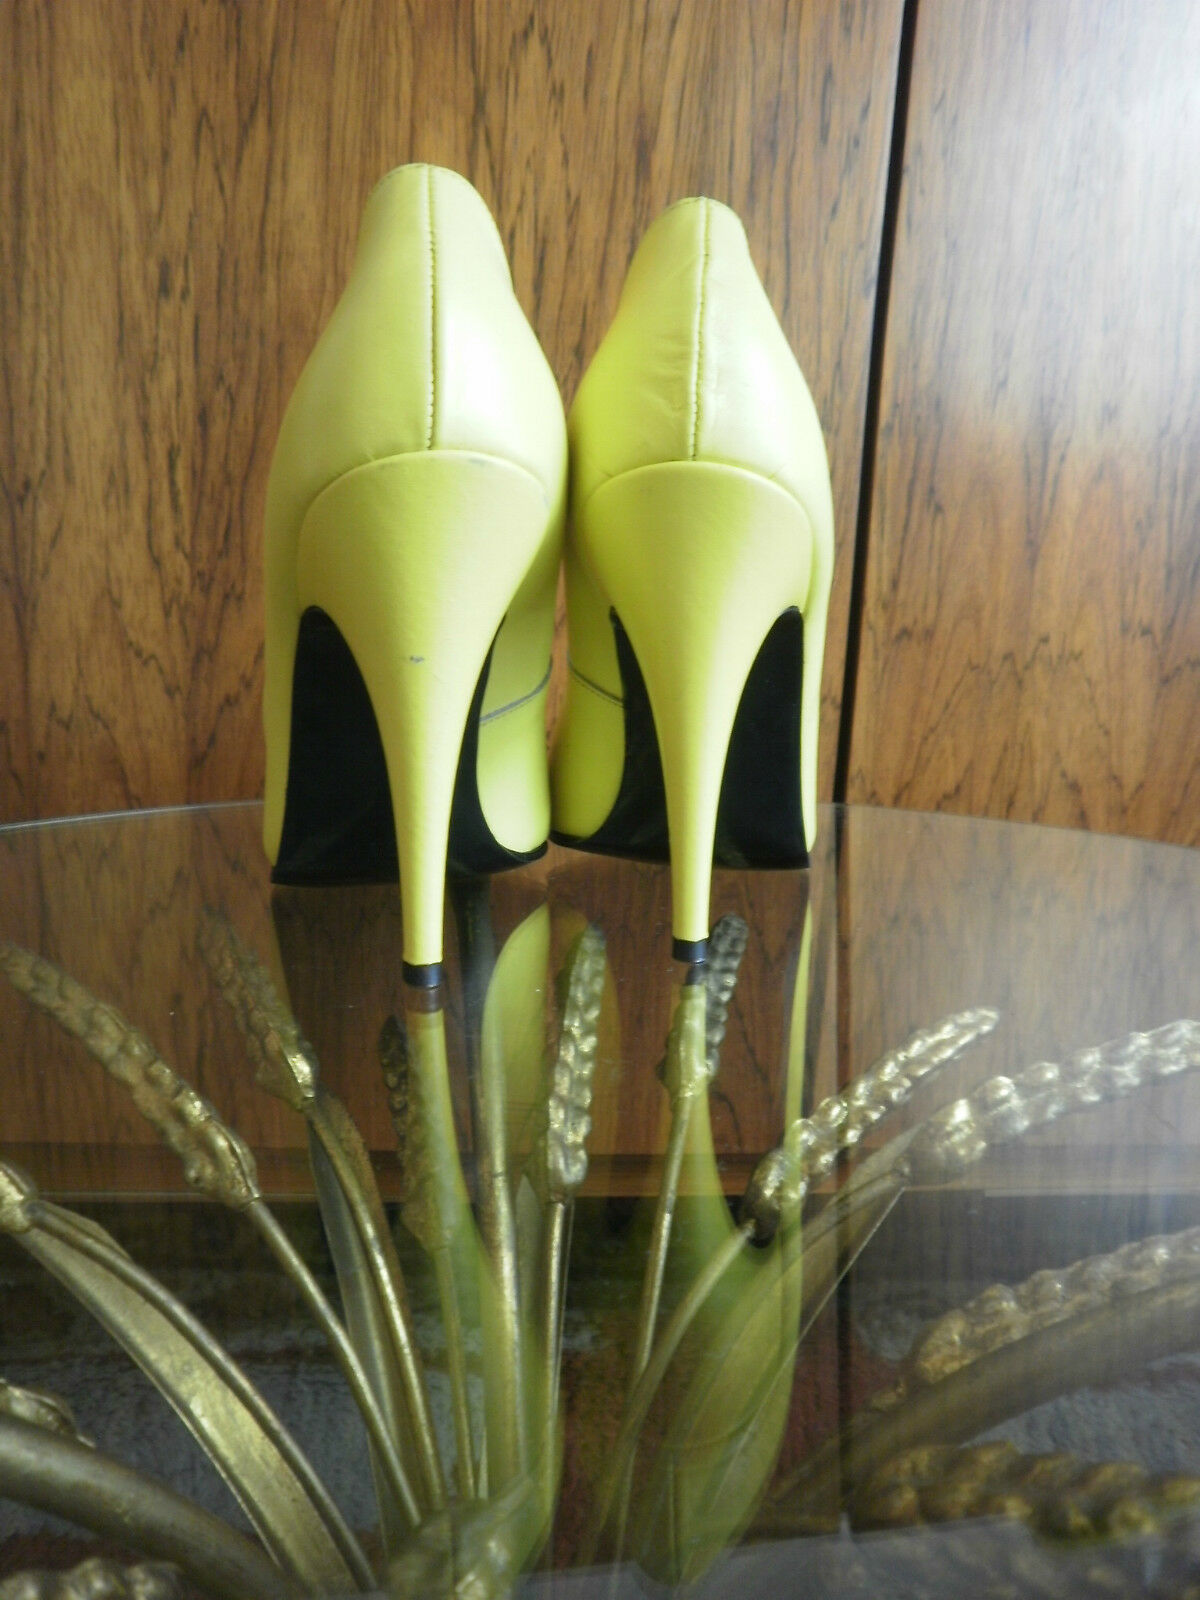 Pumps ANDRE` Damen Schuhe High Heels Gelb 80er TRUE VINTAGE 80s